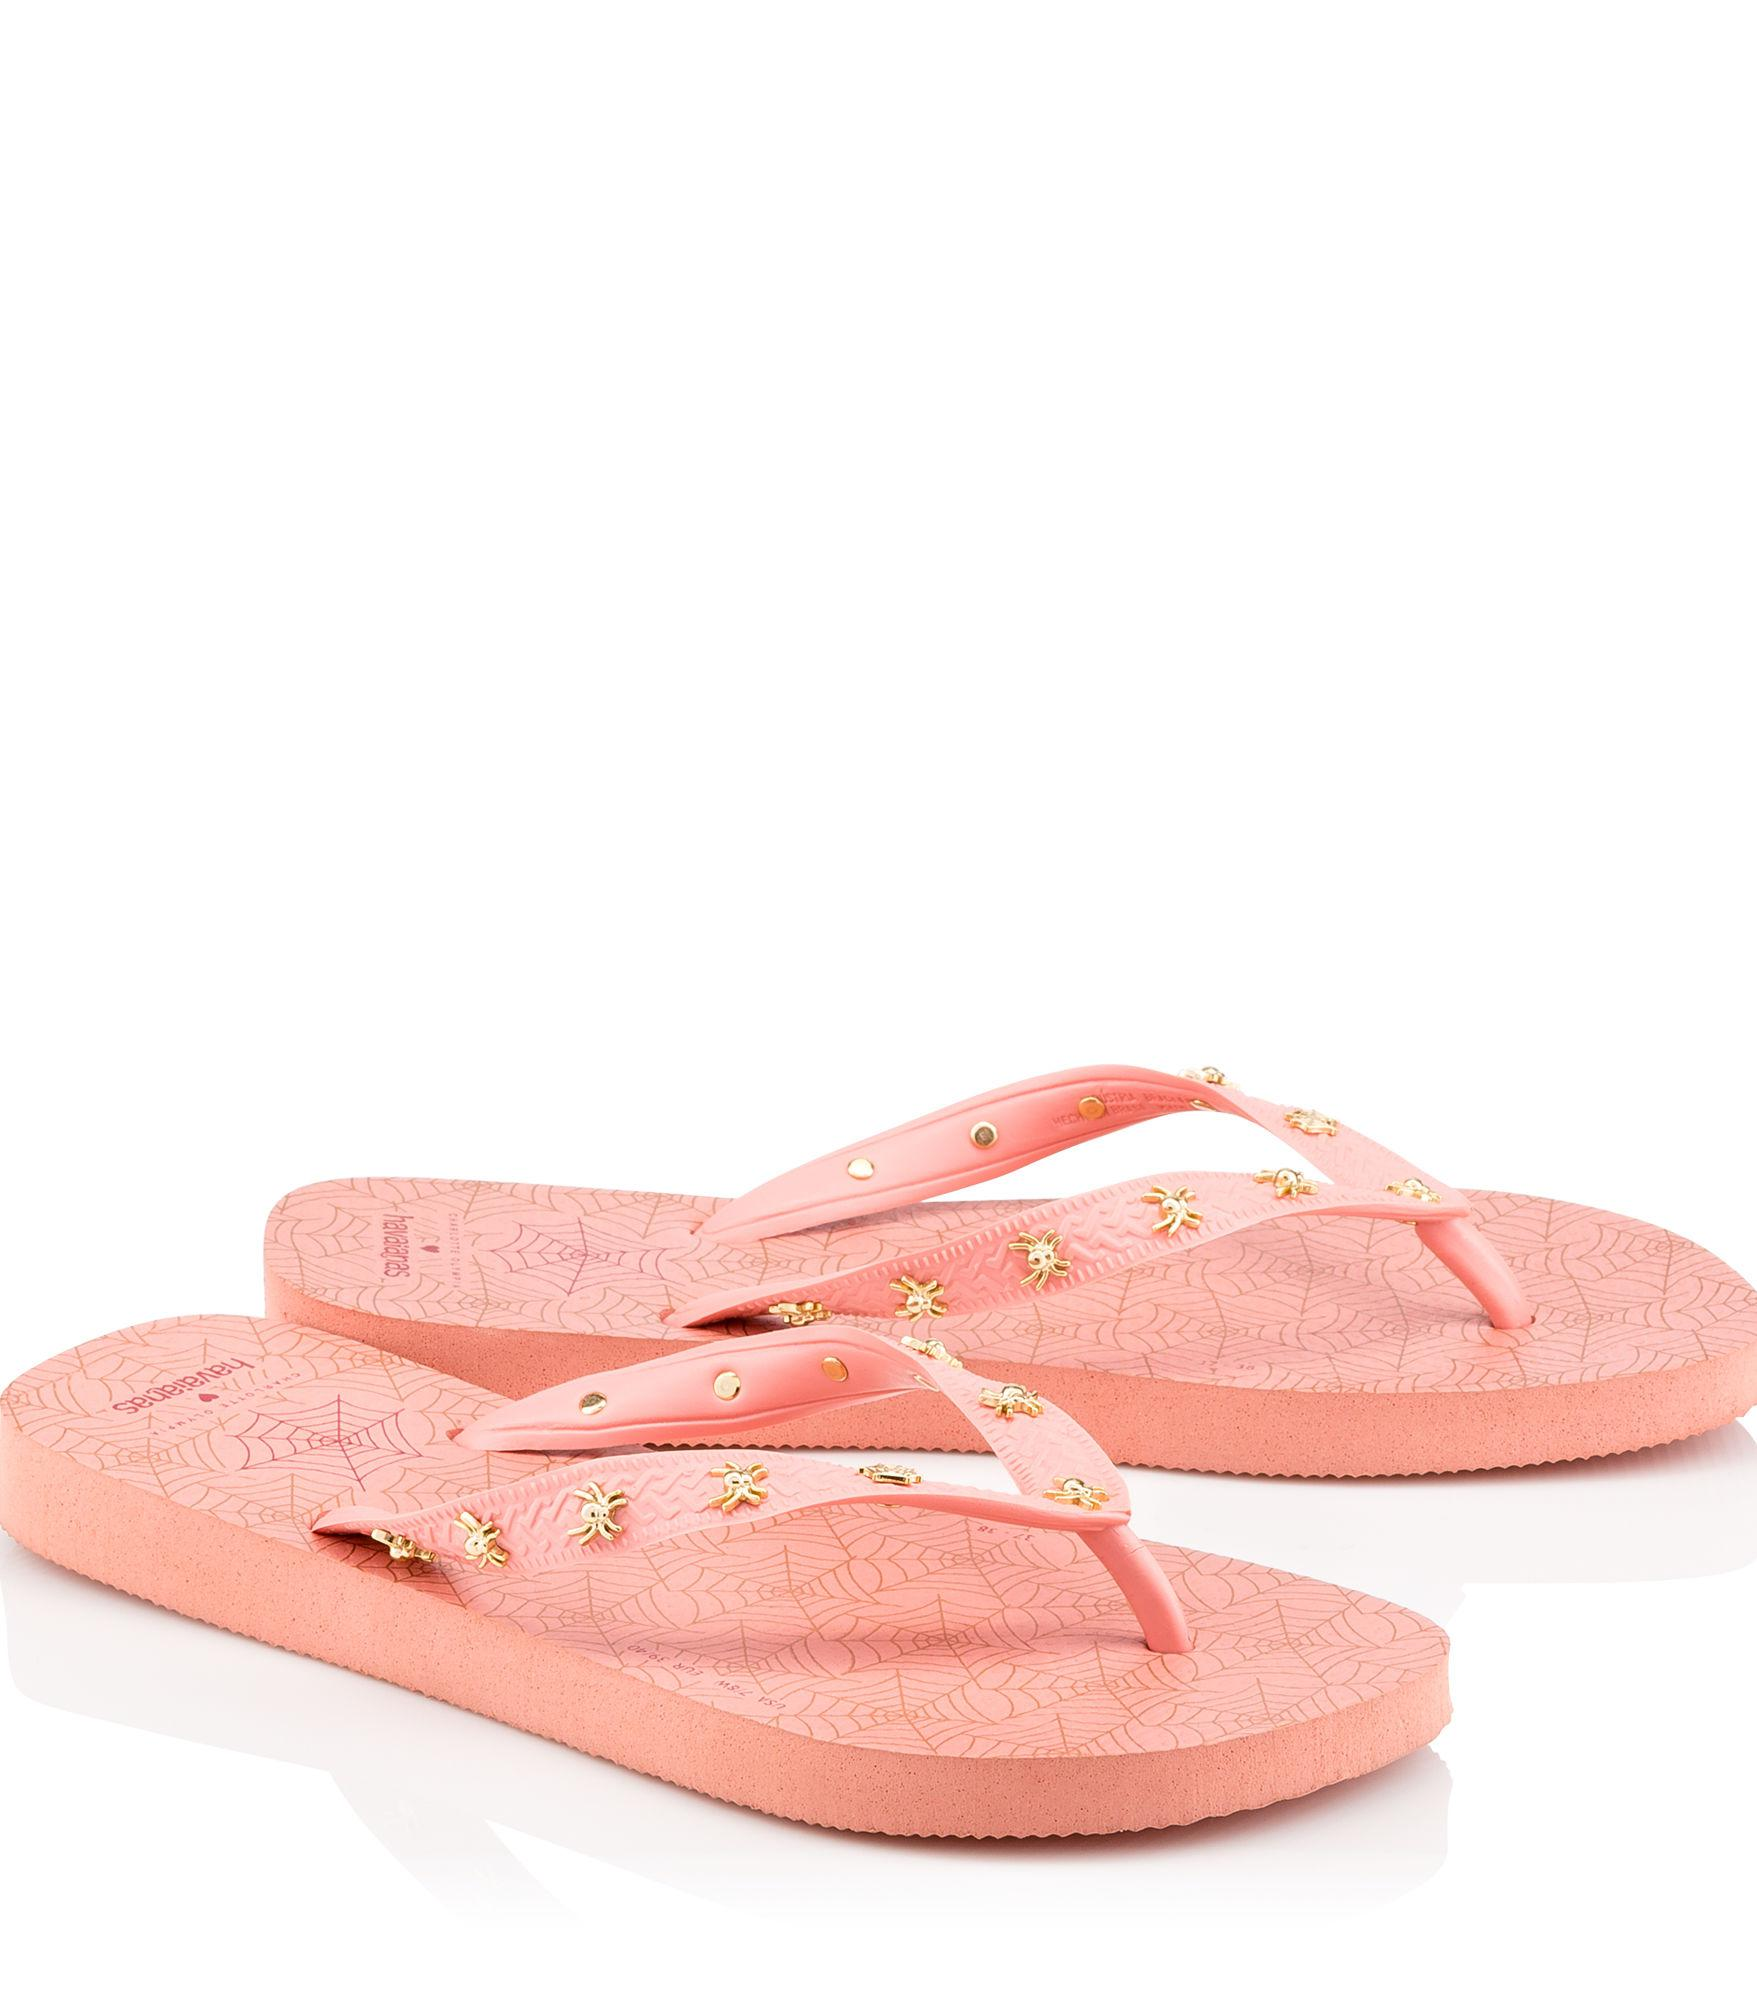 49e53e3fdb10 Lyst - Charlotte Olympia Charlotte s Web Havaianas in Pink